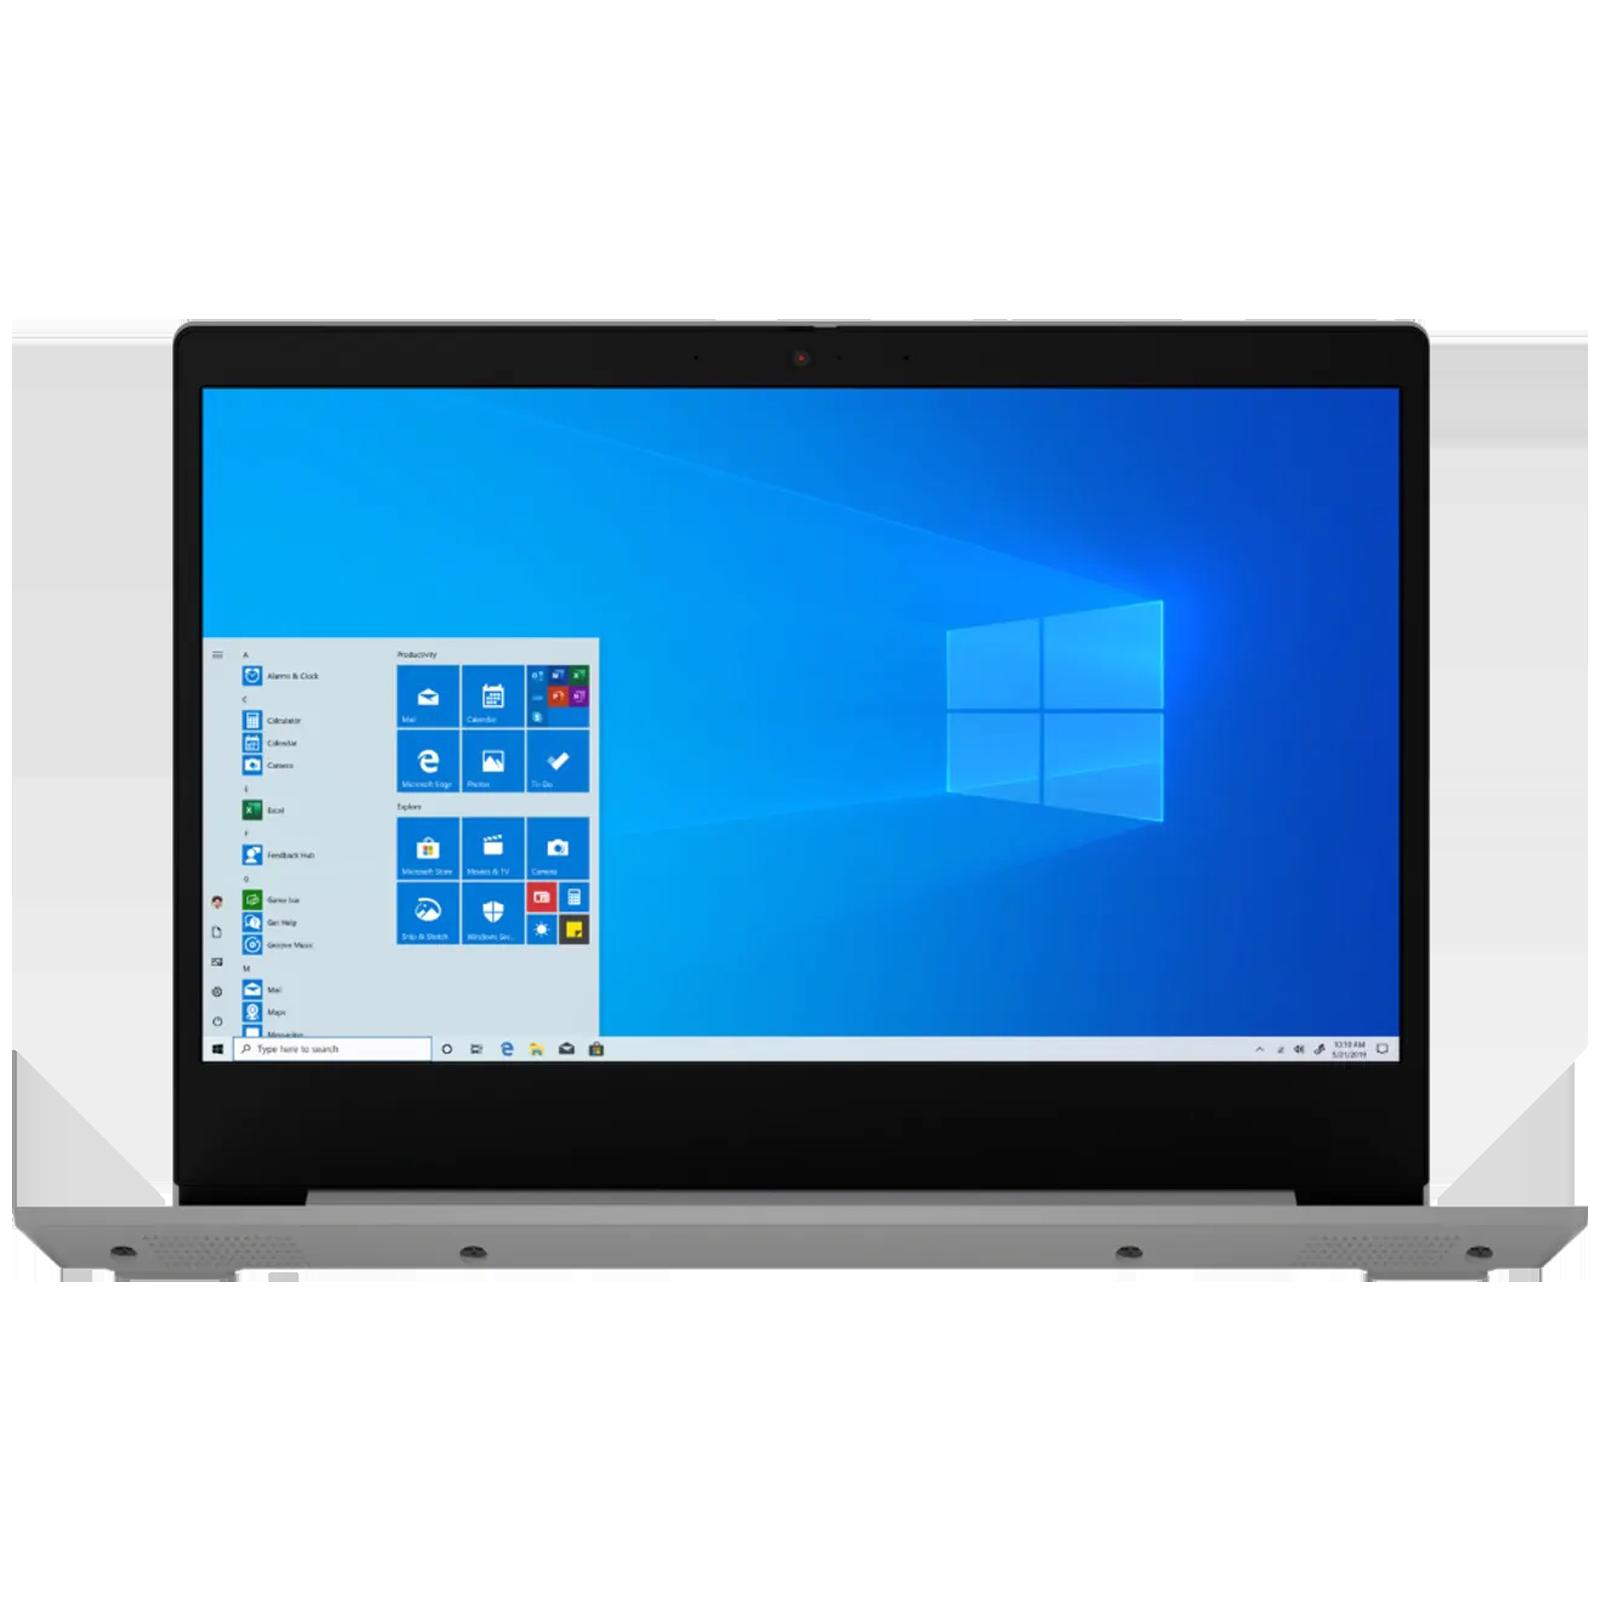 Lenovo IdeaPad 3 15ITL6 (82H800T1IN) Core i3 11th Gen Windows 10 Home Thin and Light Laptop (8GB RAM, 512GB SSD, Intel UHD Graphics, MS Office, 39.62cm, Arctic Grey)_1